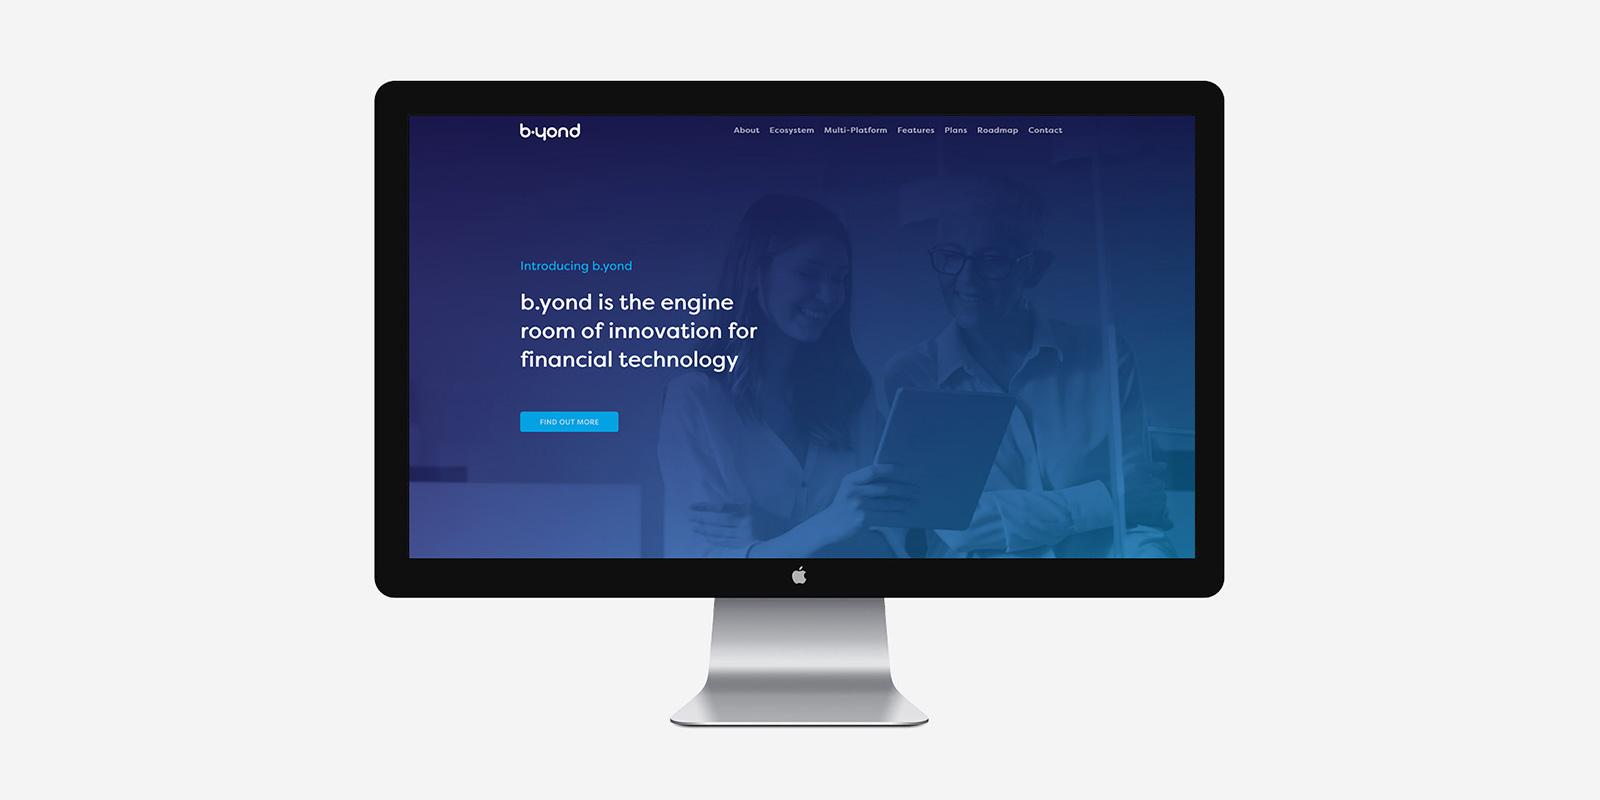 b-yond website desktop display